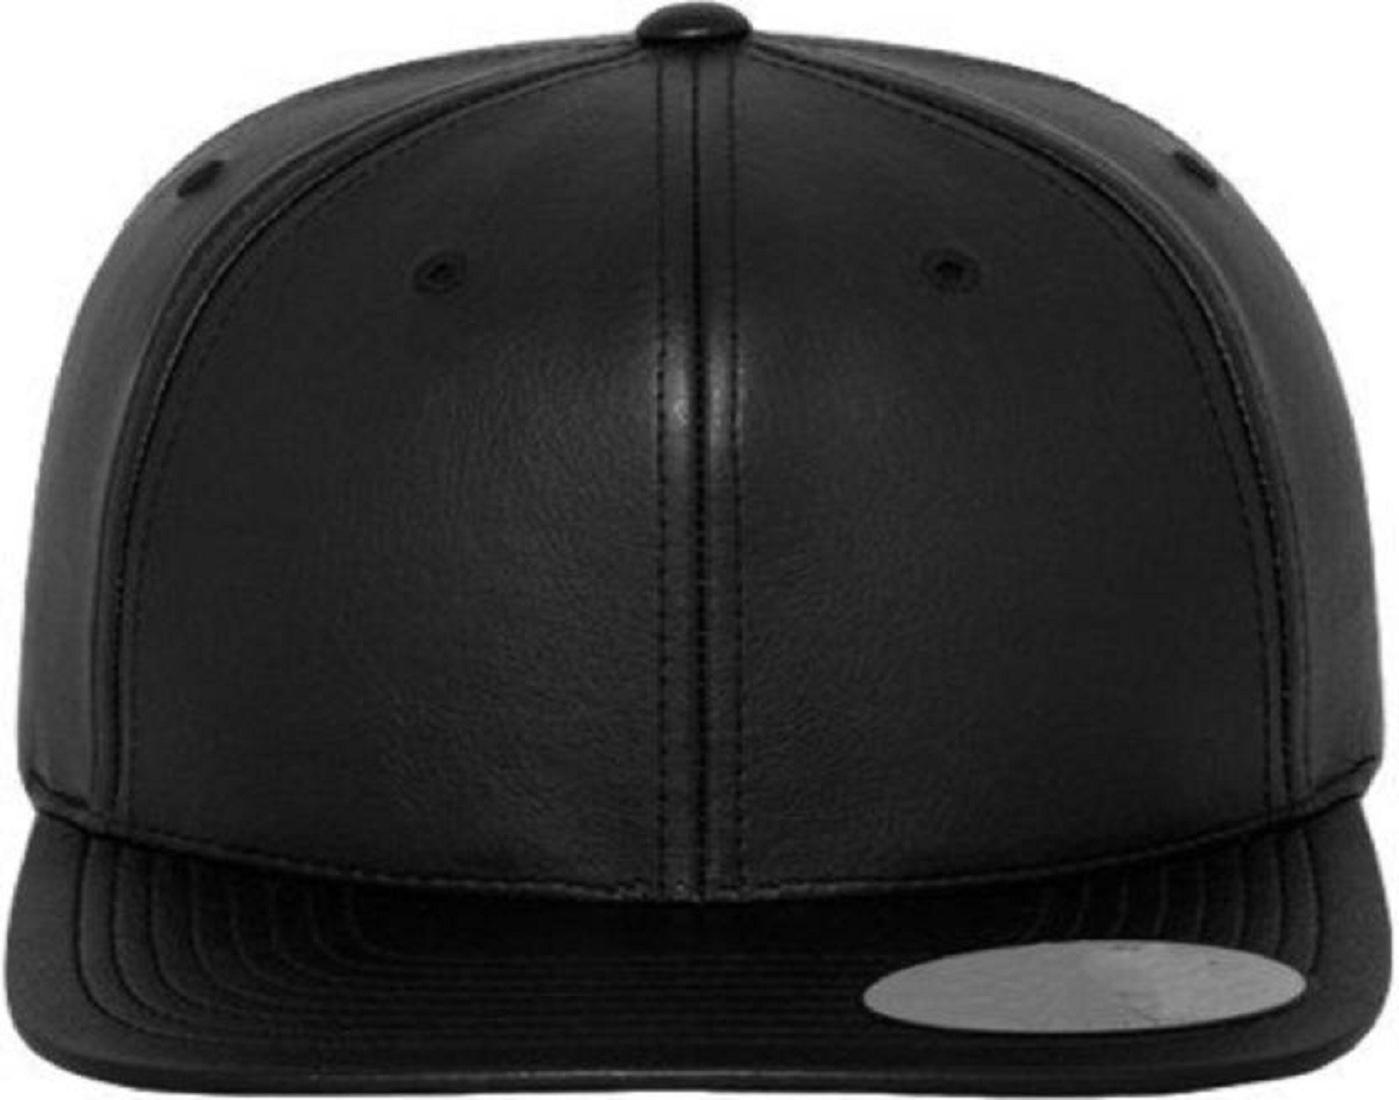 9ea9f22b2 FAS Solid Black Faux Leather, Snapback, baseball, Hip Hop, Trucker, Hat, Cap